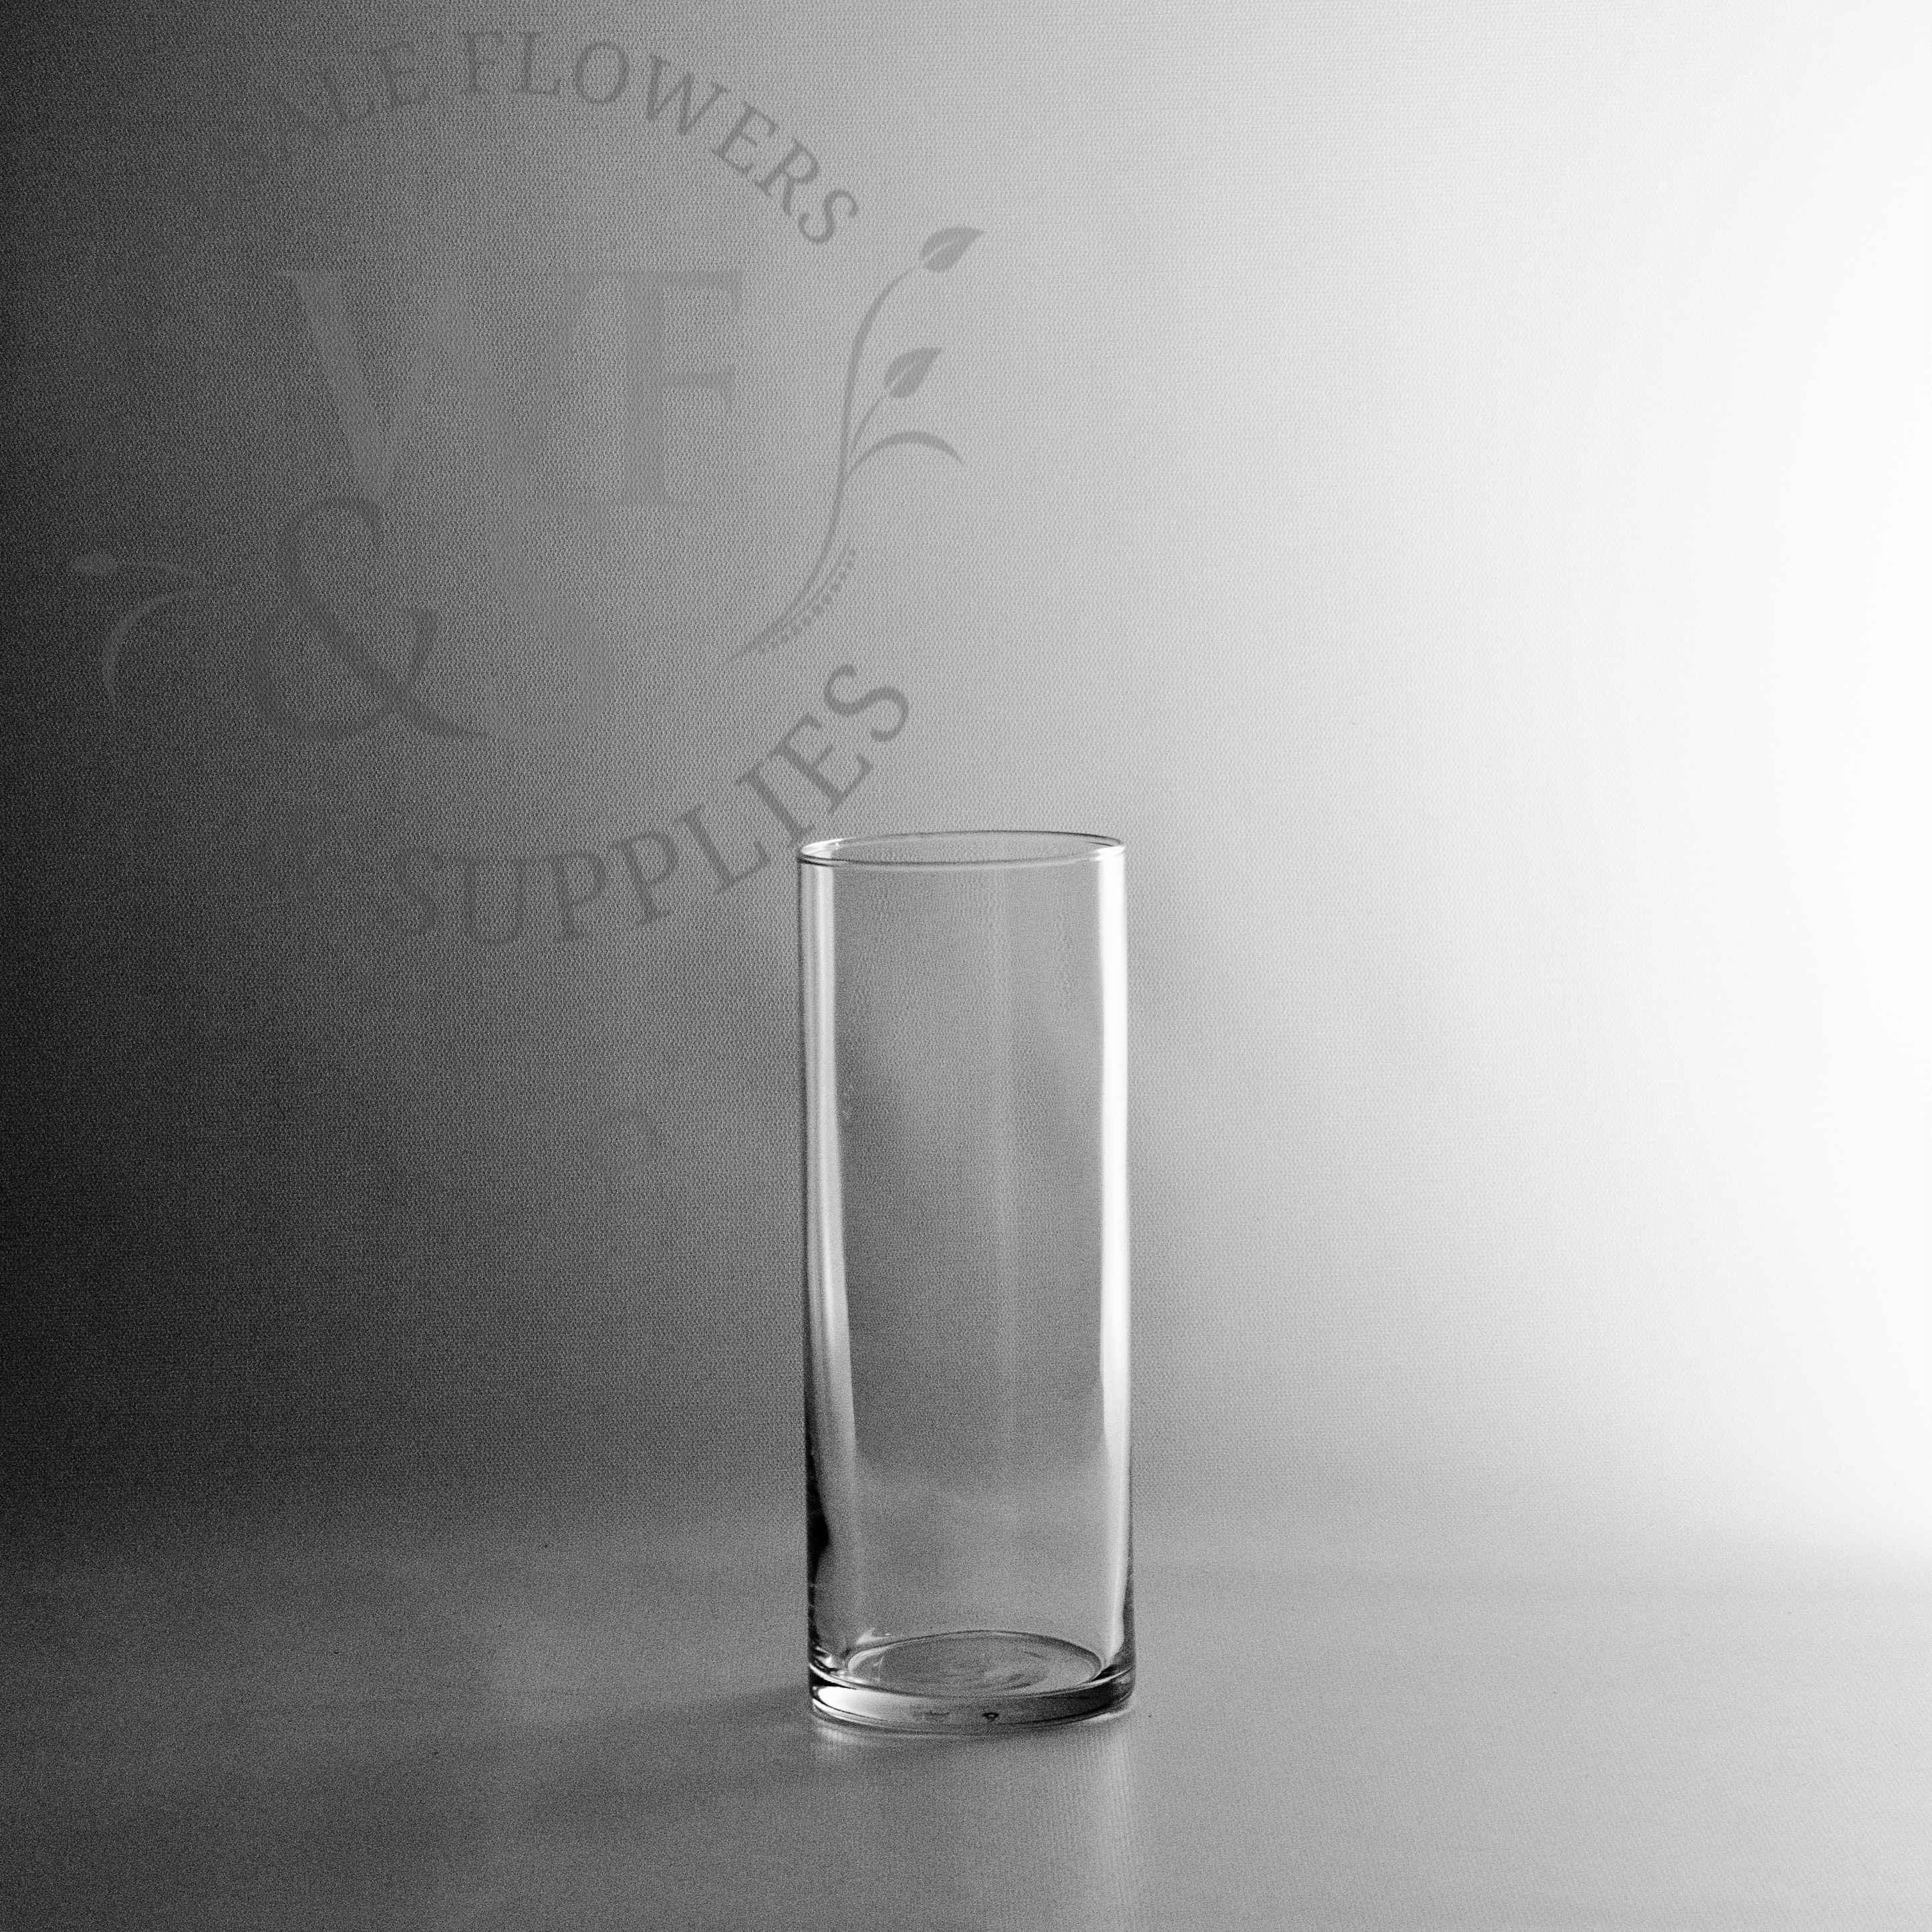 clear barcelona vases of glass cylinder vases wholesale flowers supplies for 9 x 3 25 glass cylinder vase